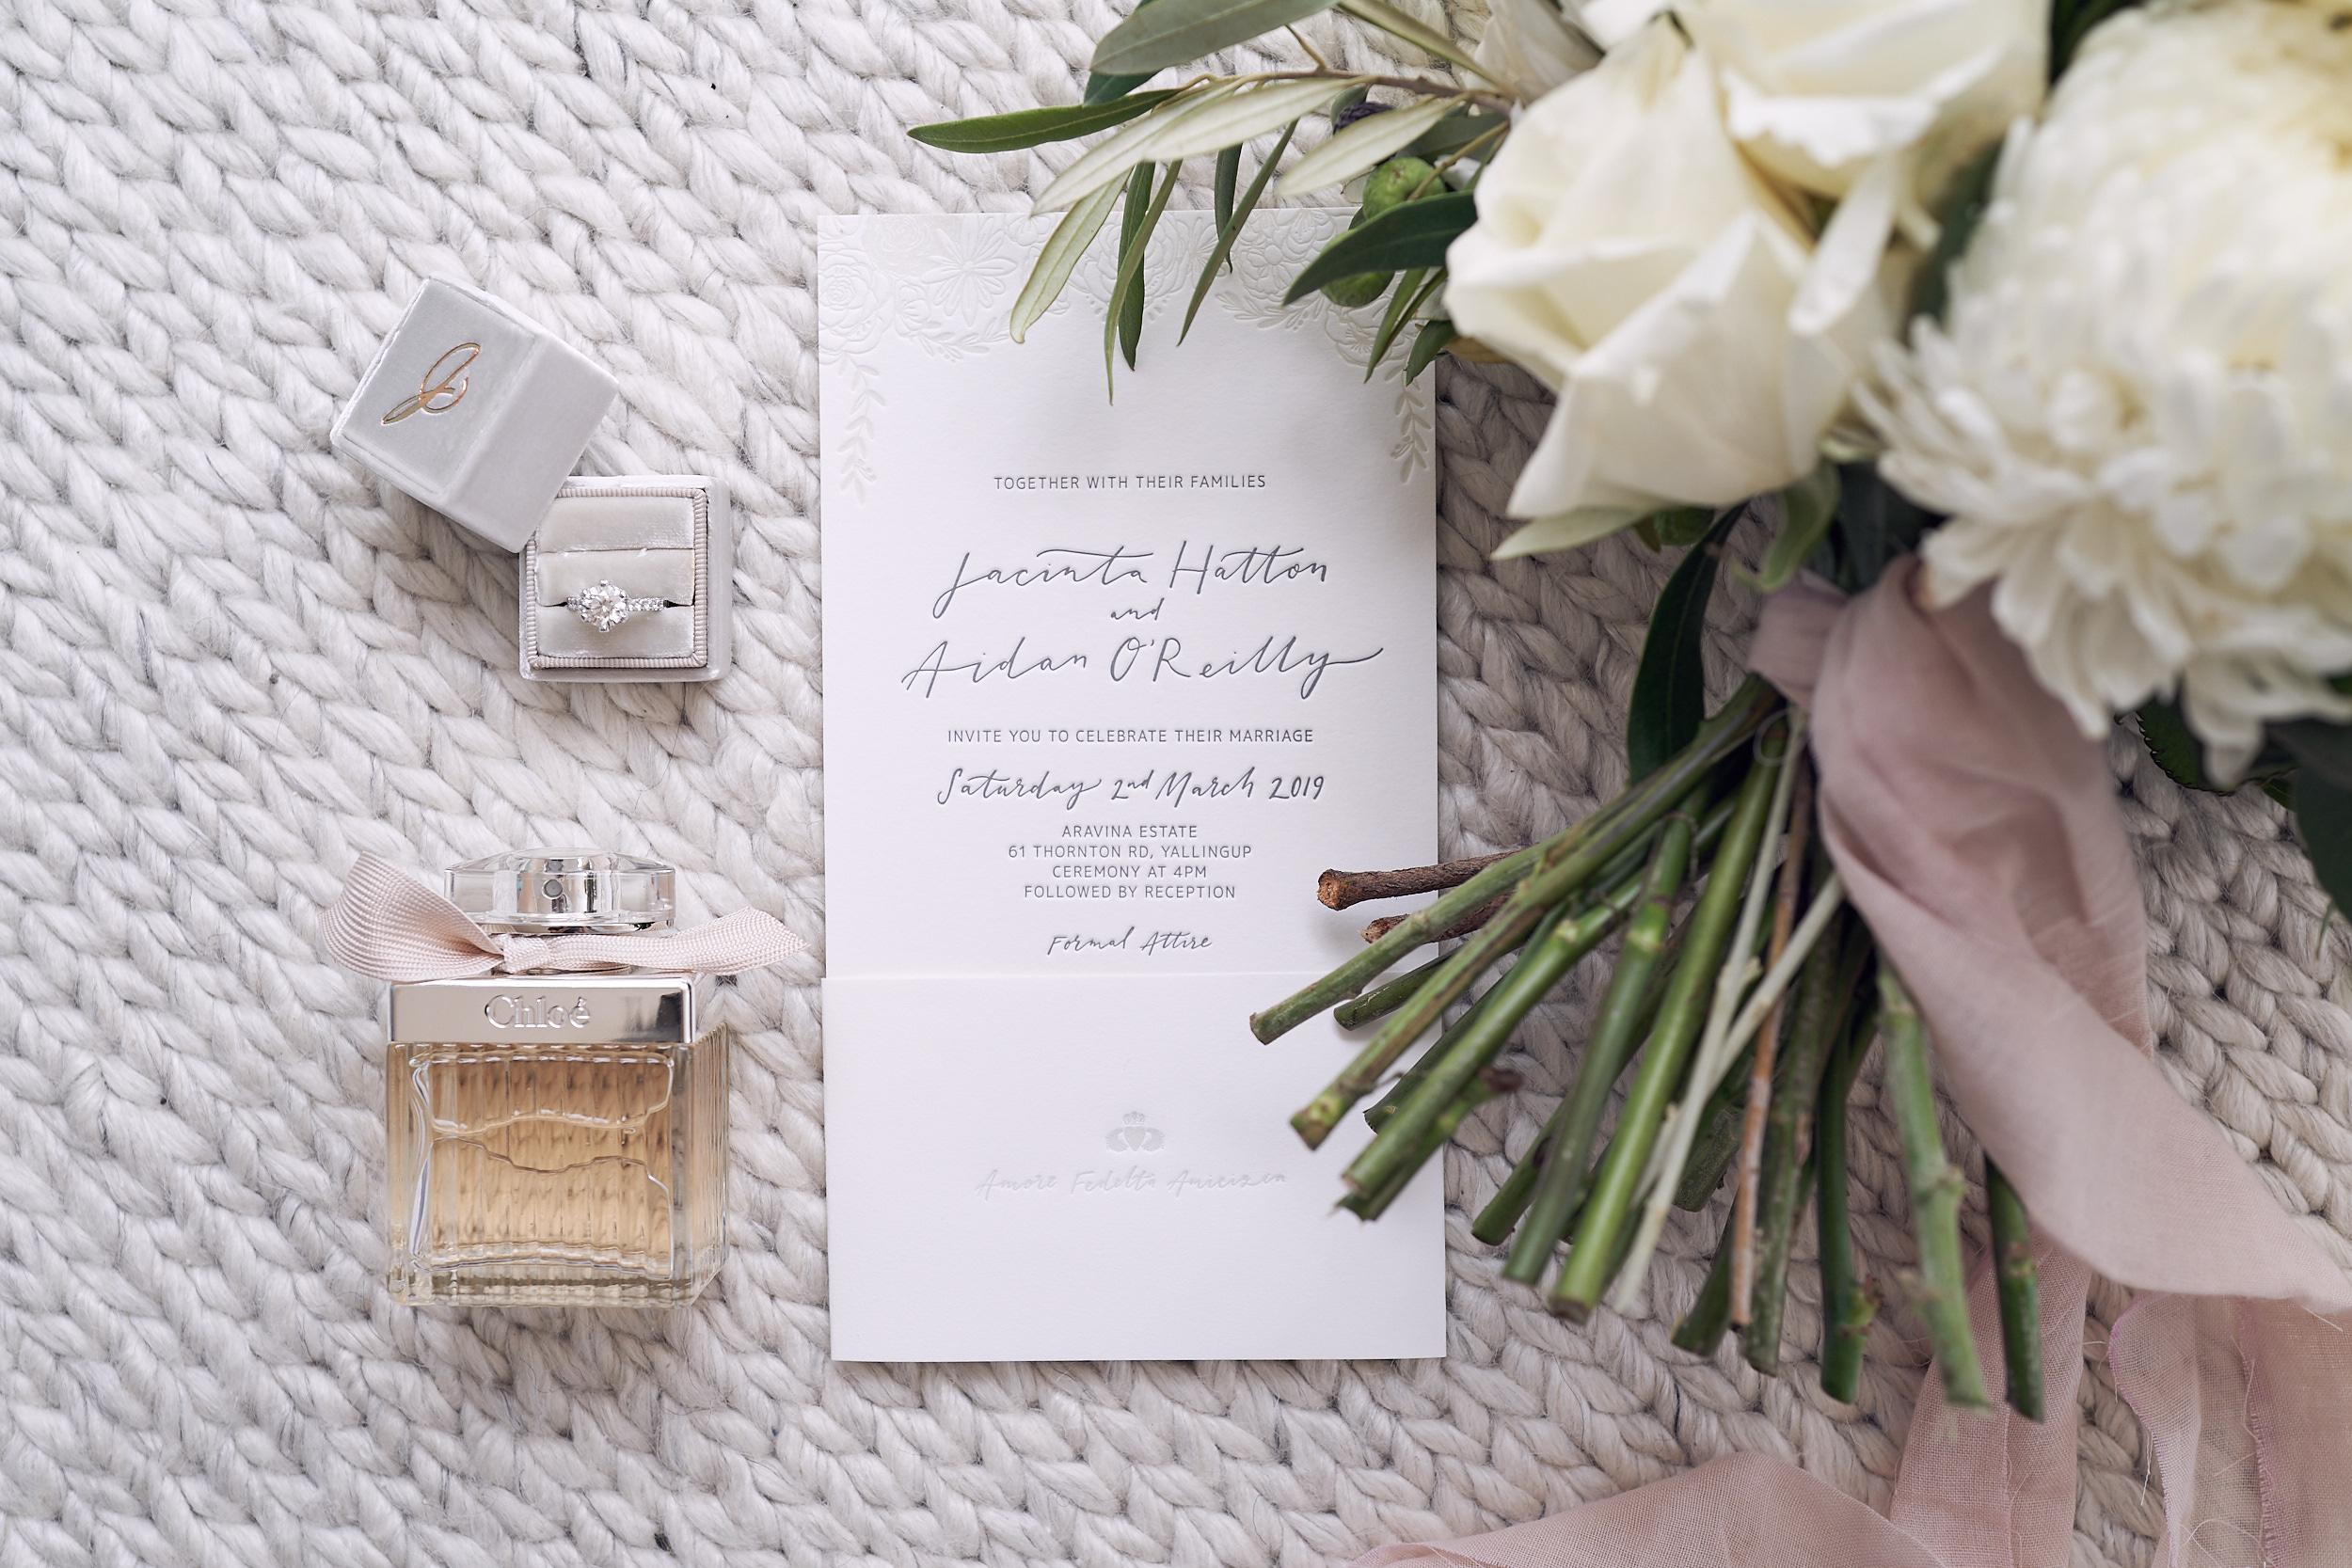 LR_JandA-aravina-wedding-LostInLove 140.jpg